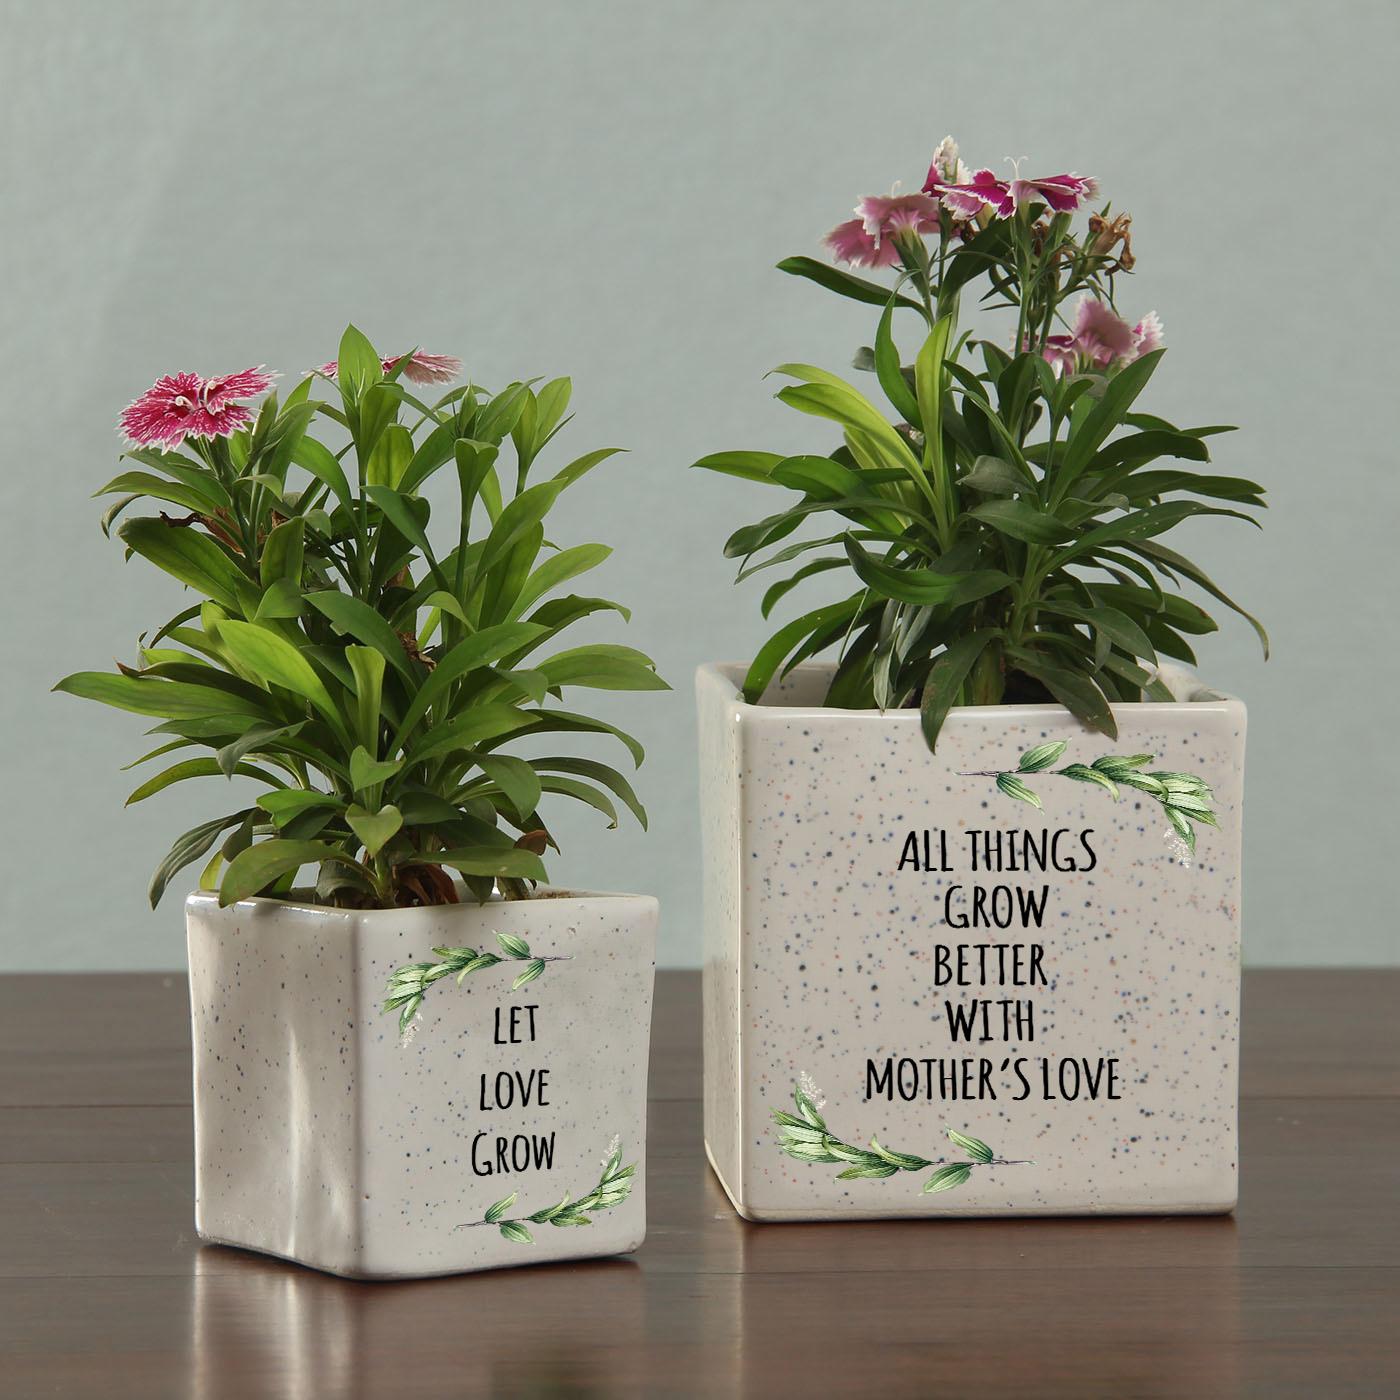 Personalized Ceramic Planters set for Mom